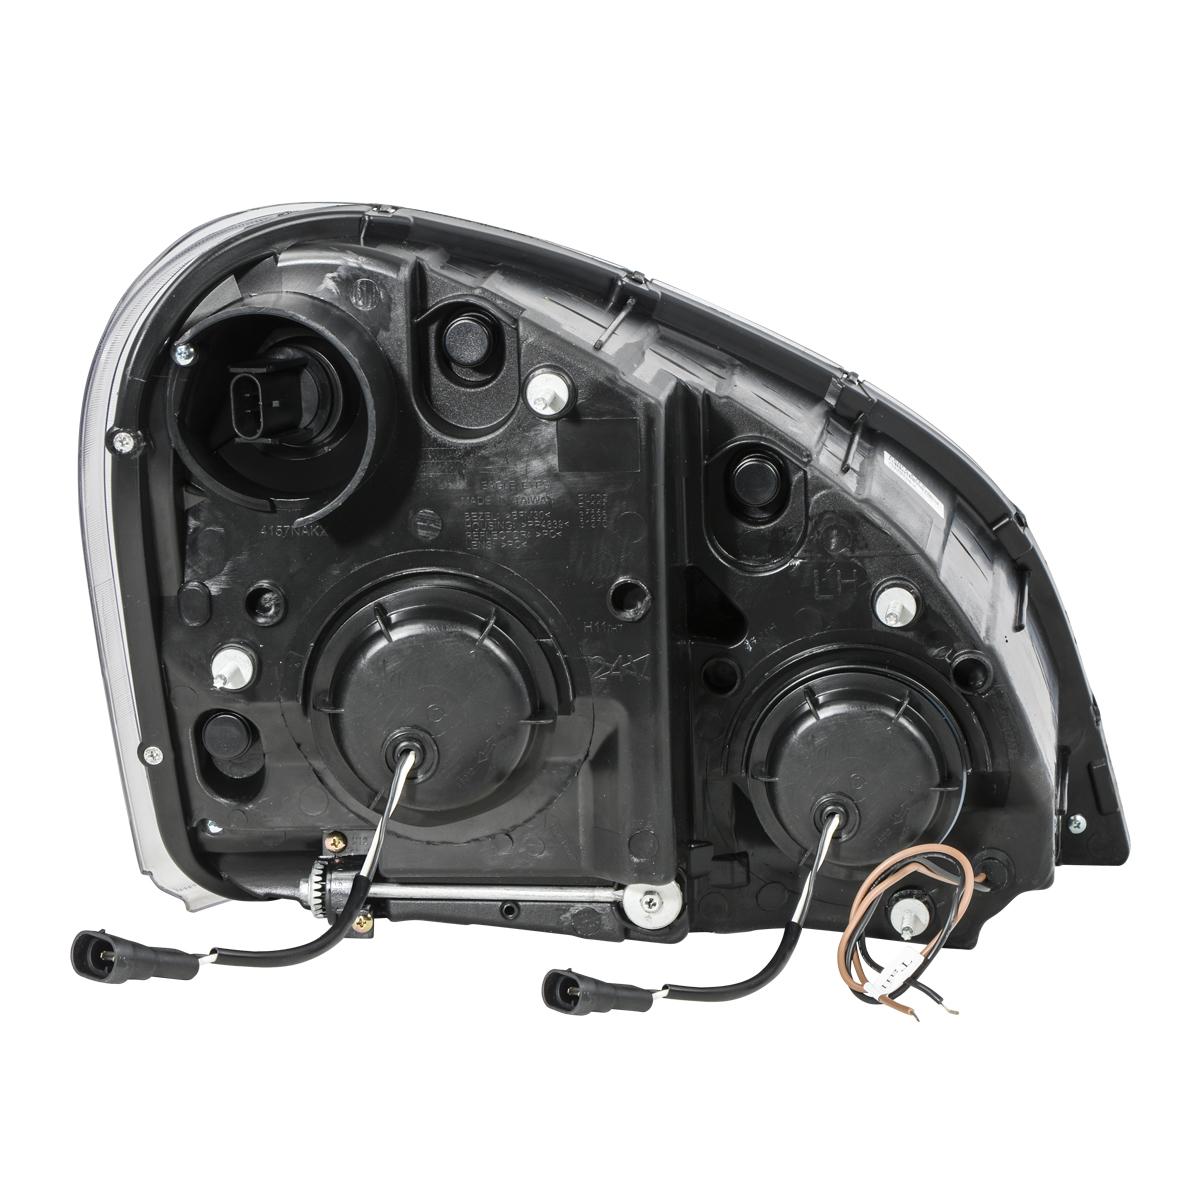 Back View - Freightliner Cascadia Matte Black Projector Headlight w/ White LED Running Light